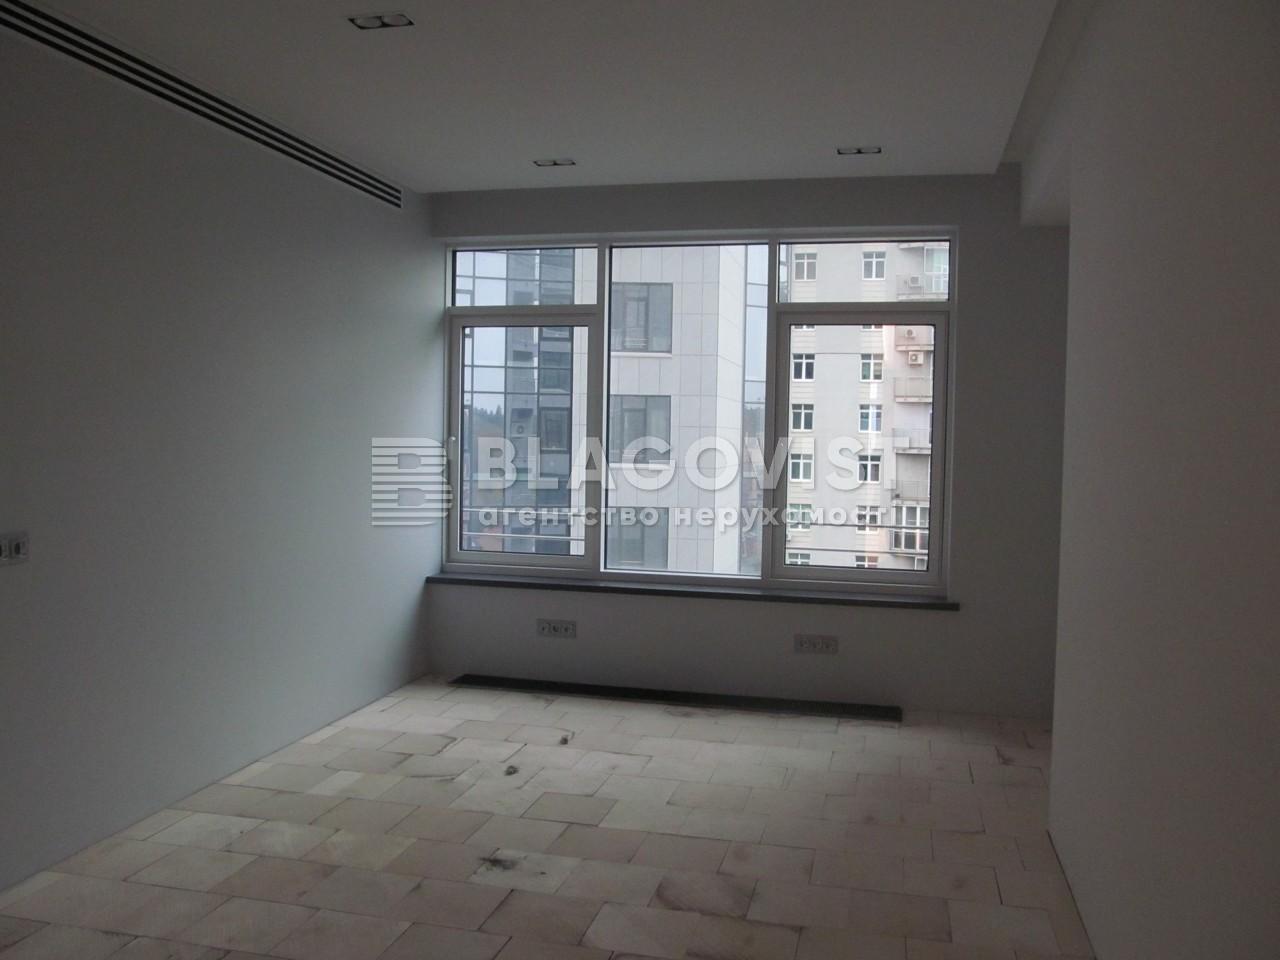 Квартира C-105760, Буслівська, 12, Київ - Фото 8